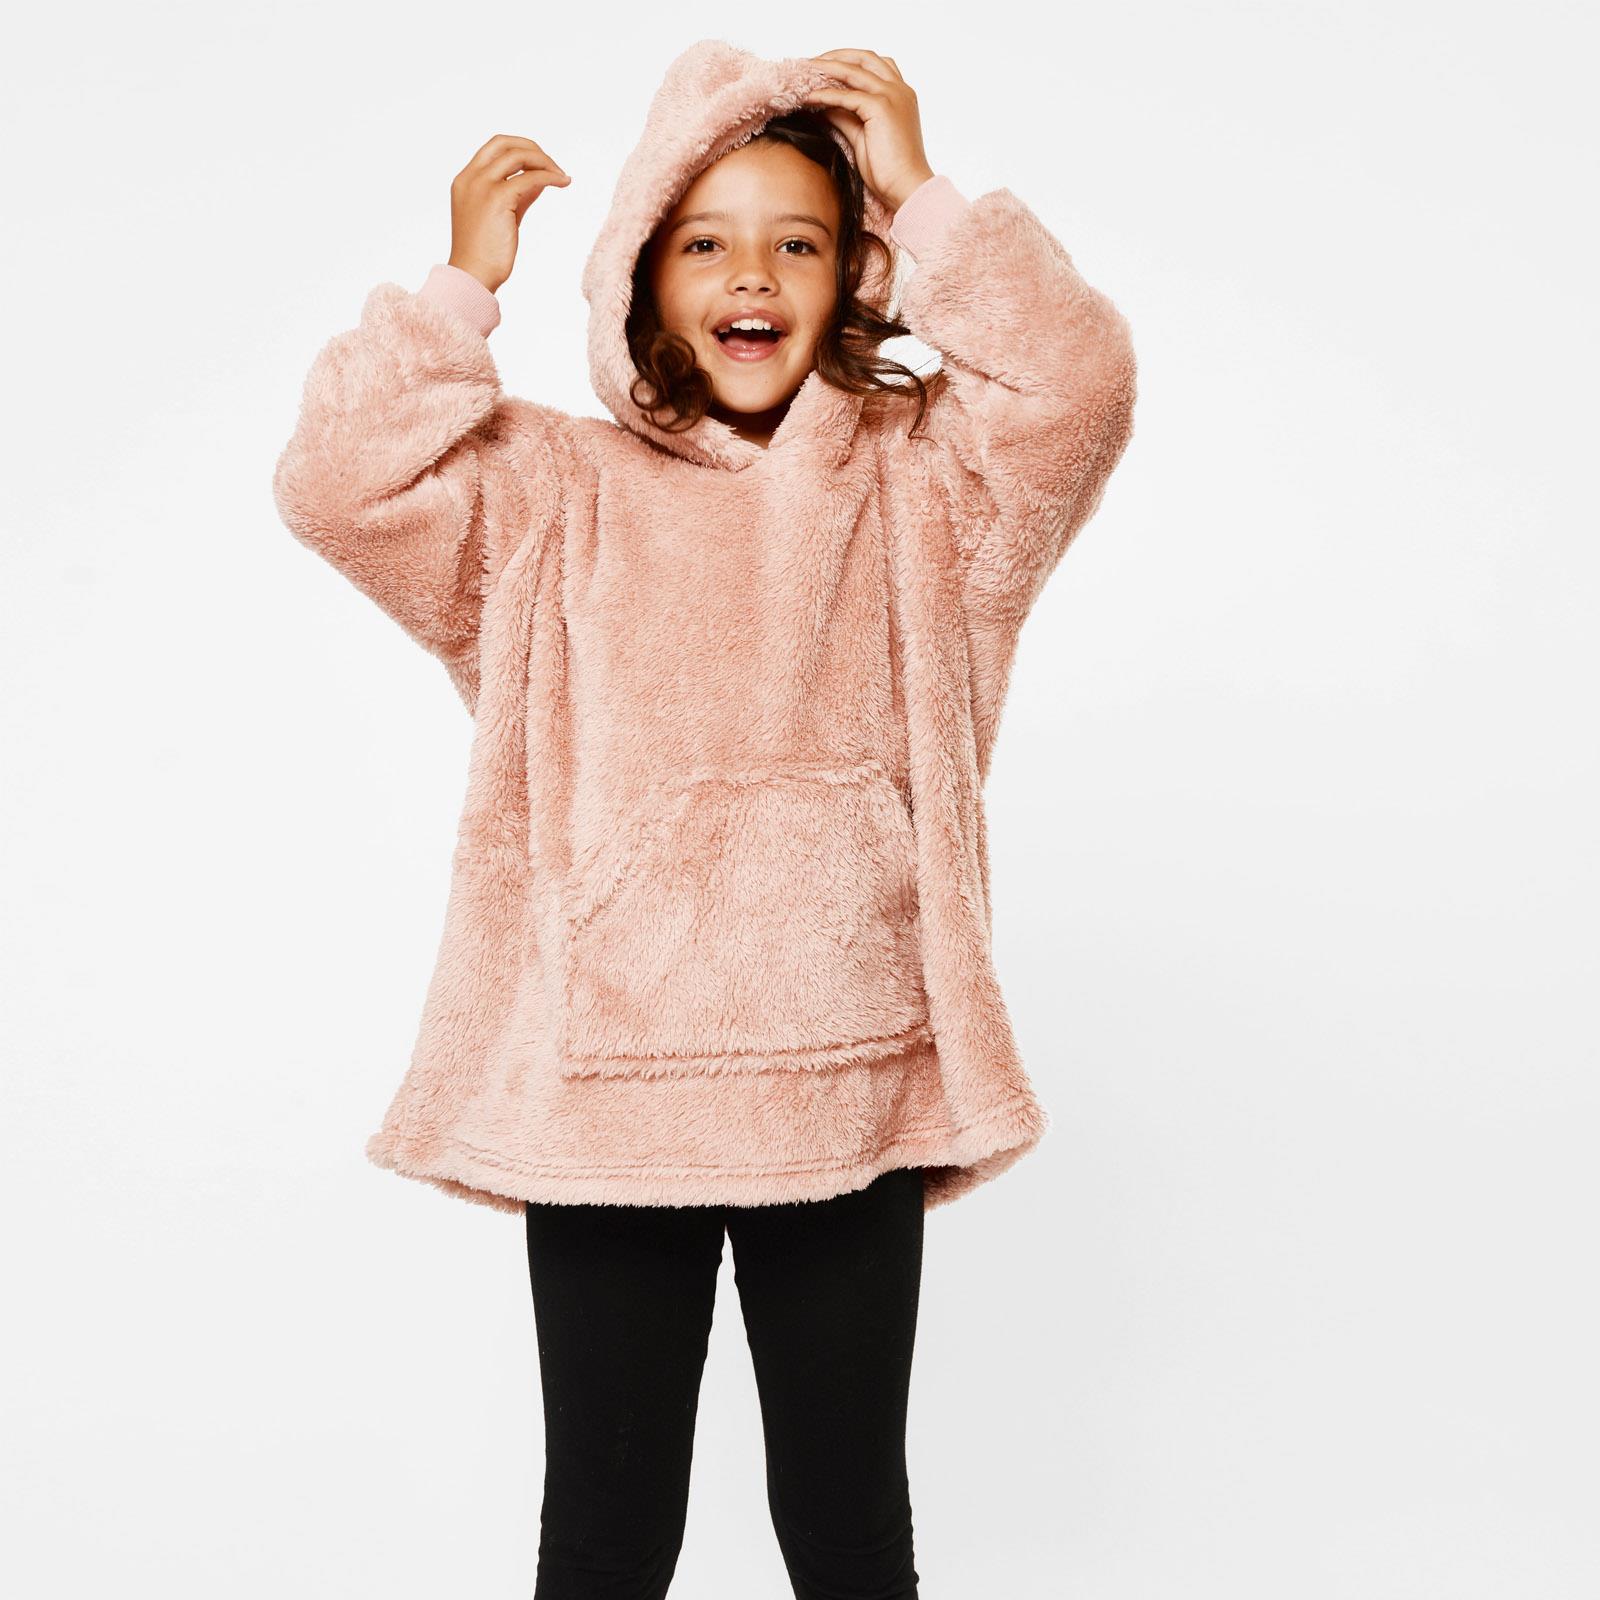 thumbnail 11 - Brentfords-Teddy-Fleece-Hoodie-Blanket-Oversized-Giant-Wearable-Adults-Kids-UK